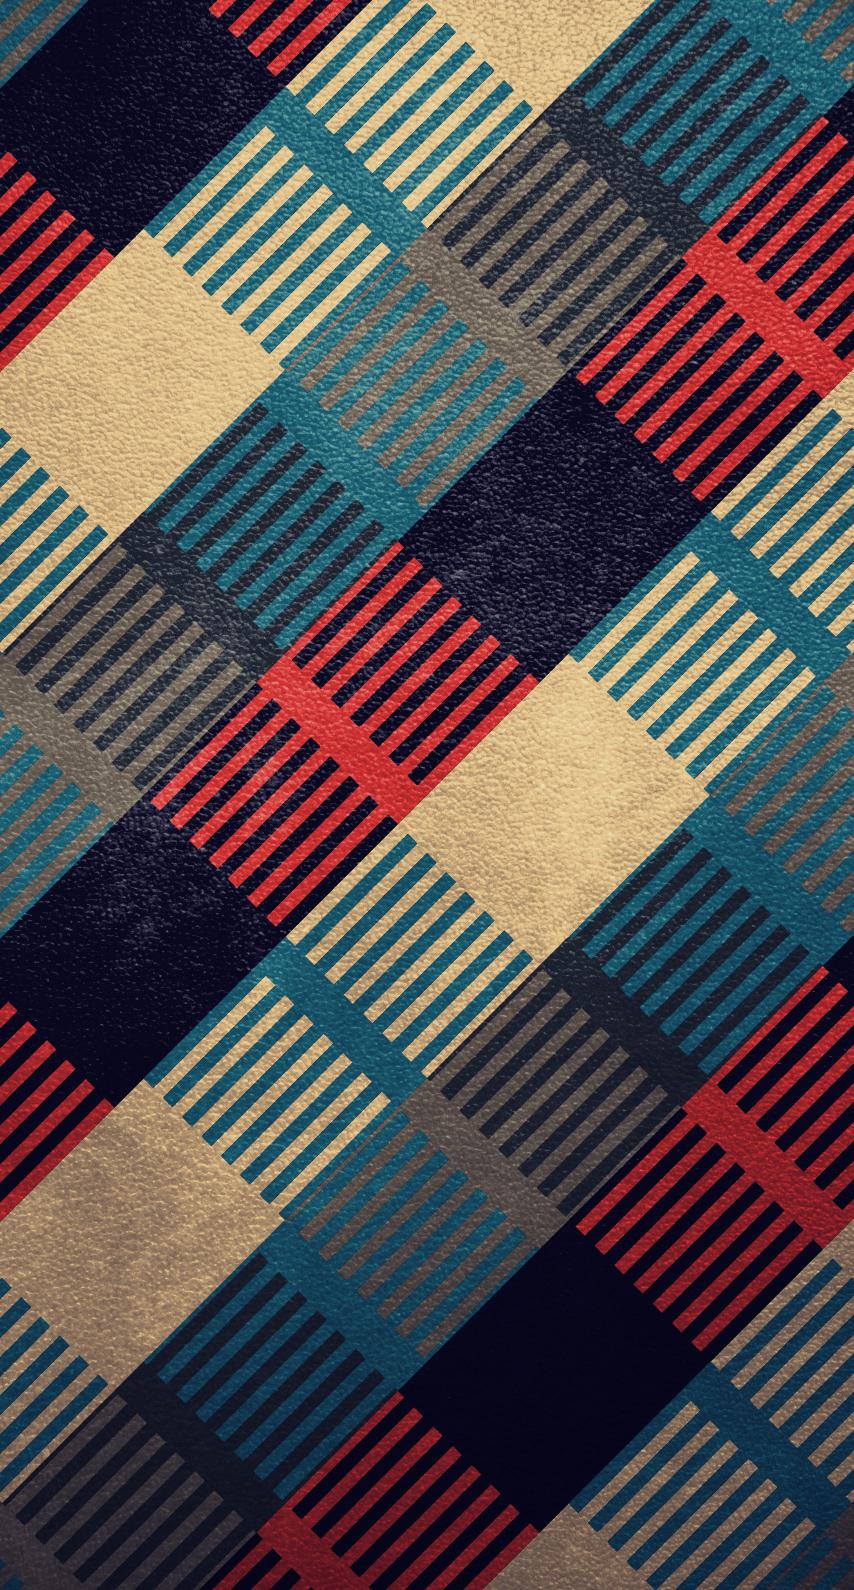 flooring, woven fabric